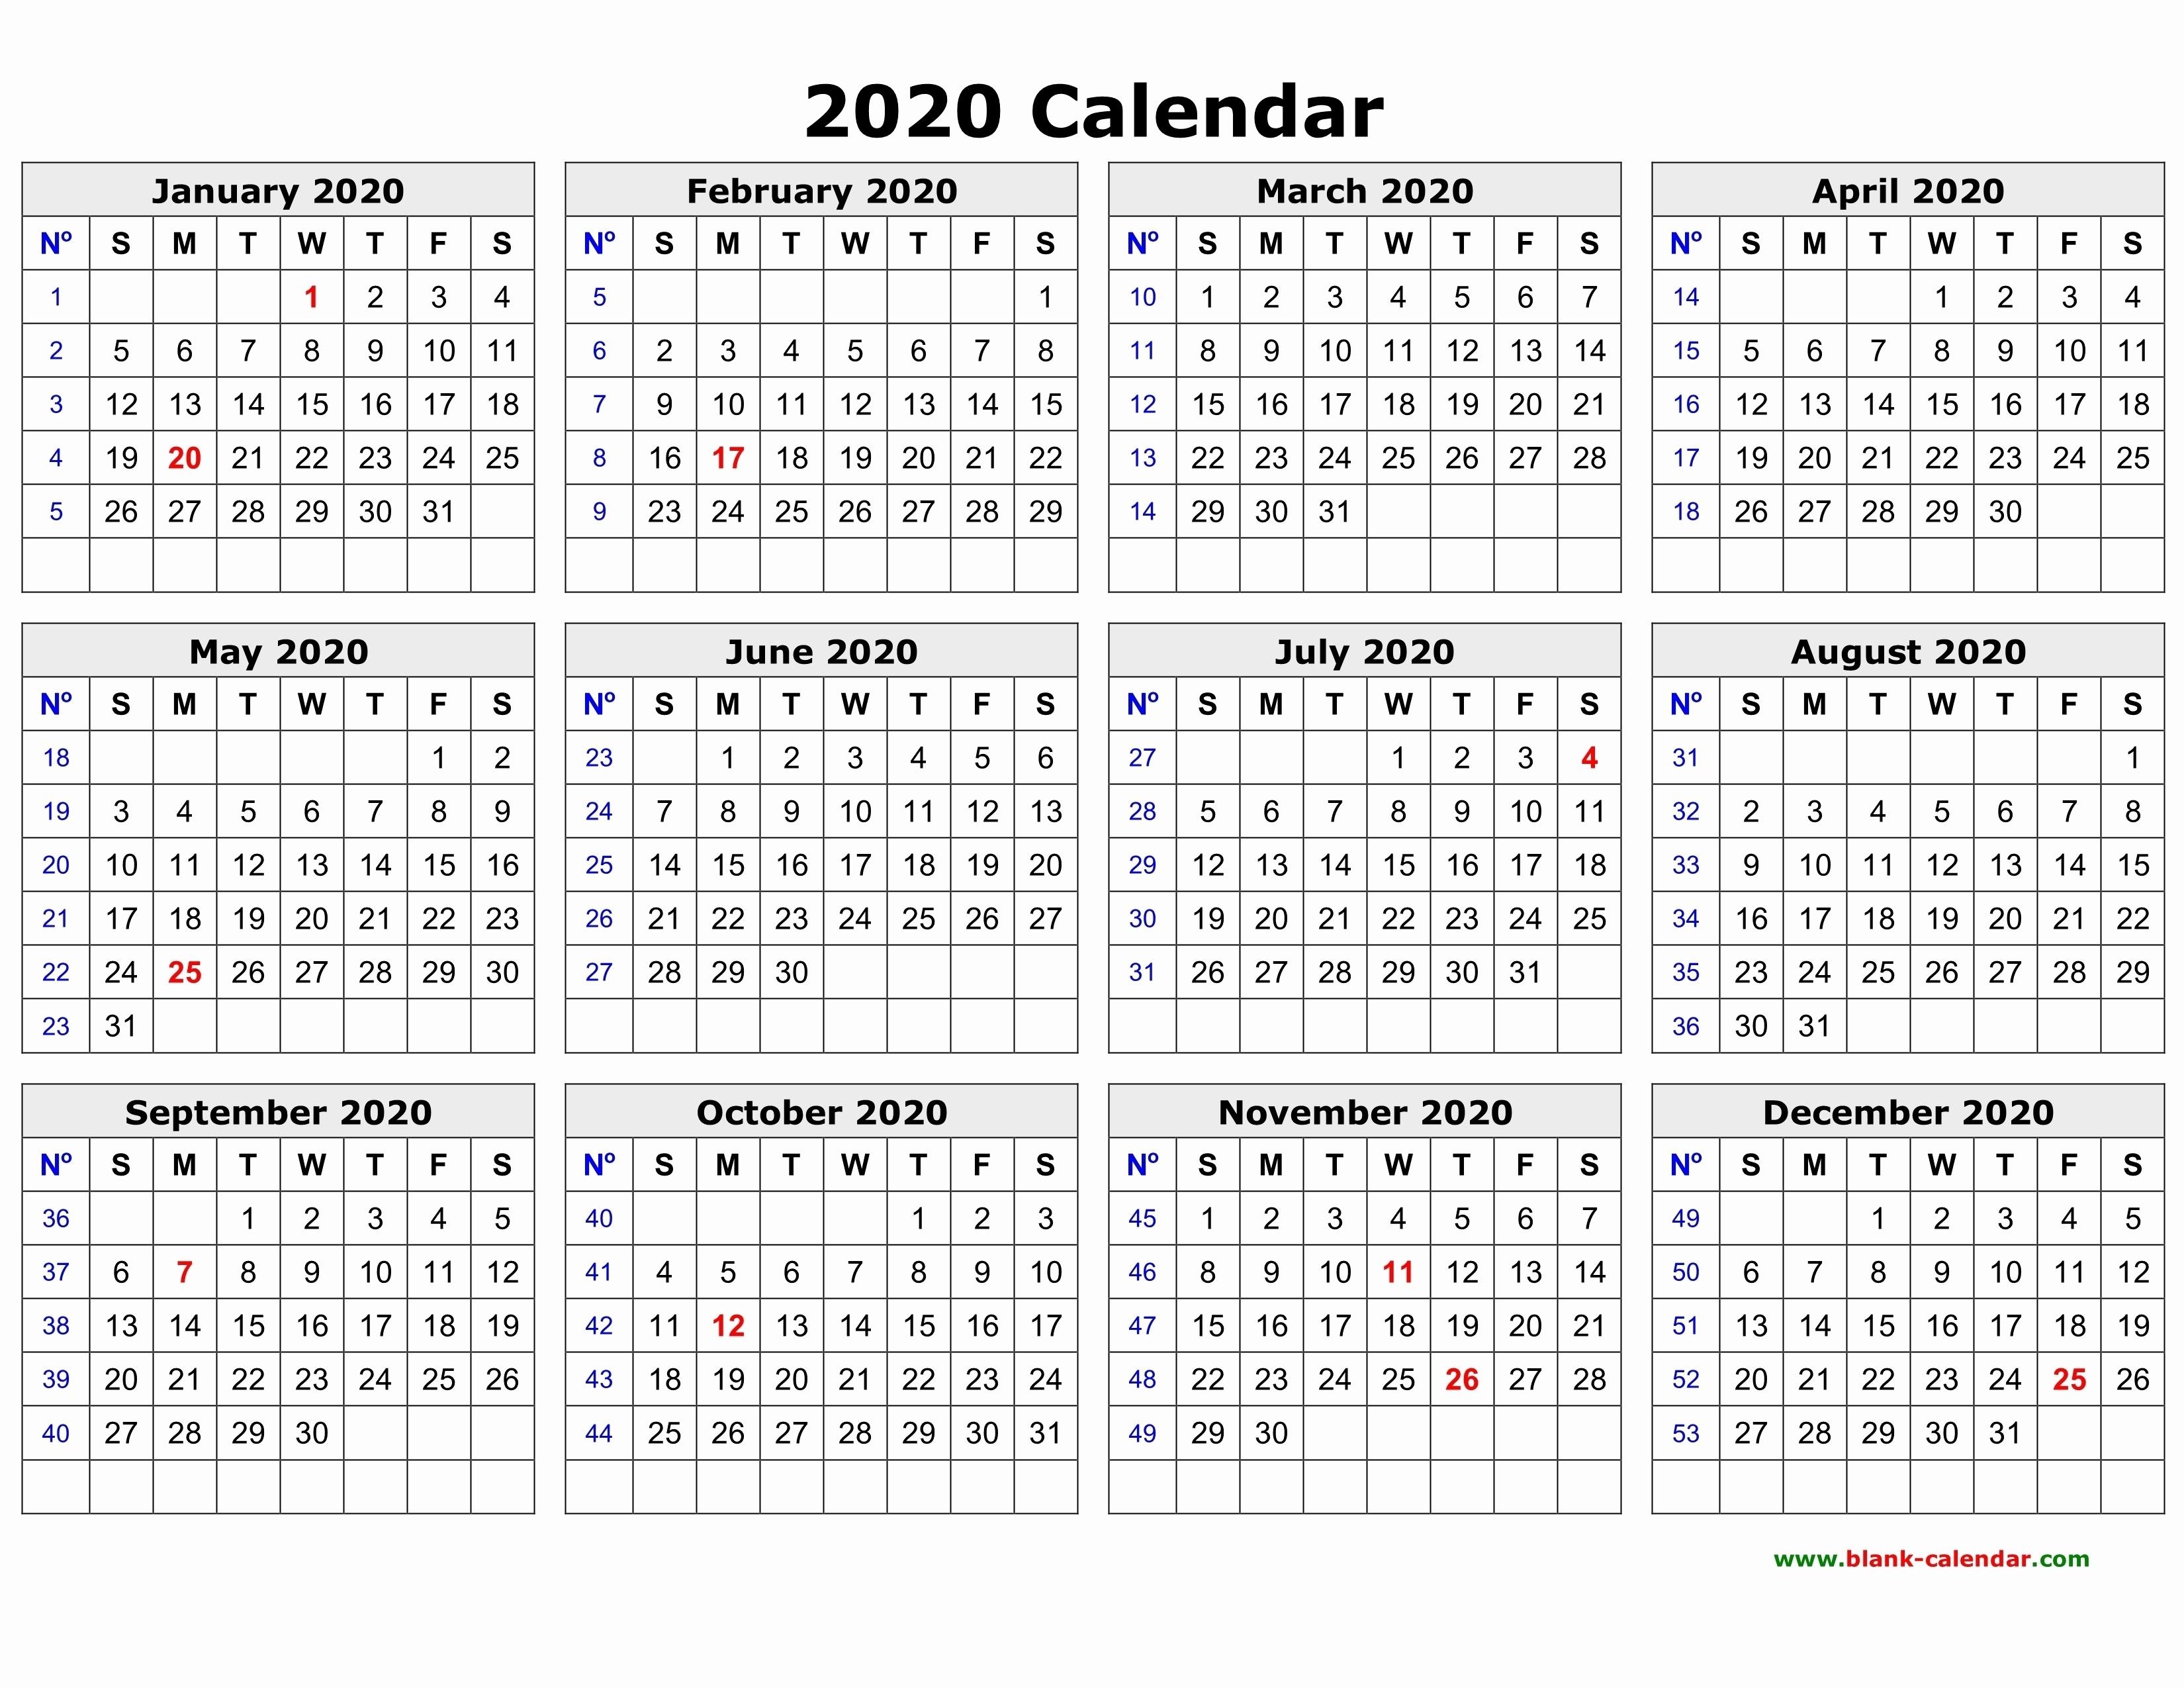 Calendar For School Year 2020-19 | Calendar Design Ideas_Calendar School Year 2020-19